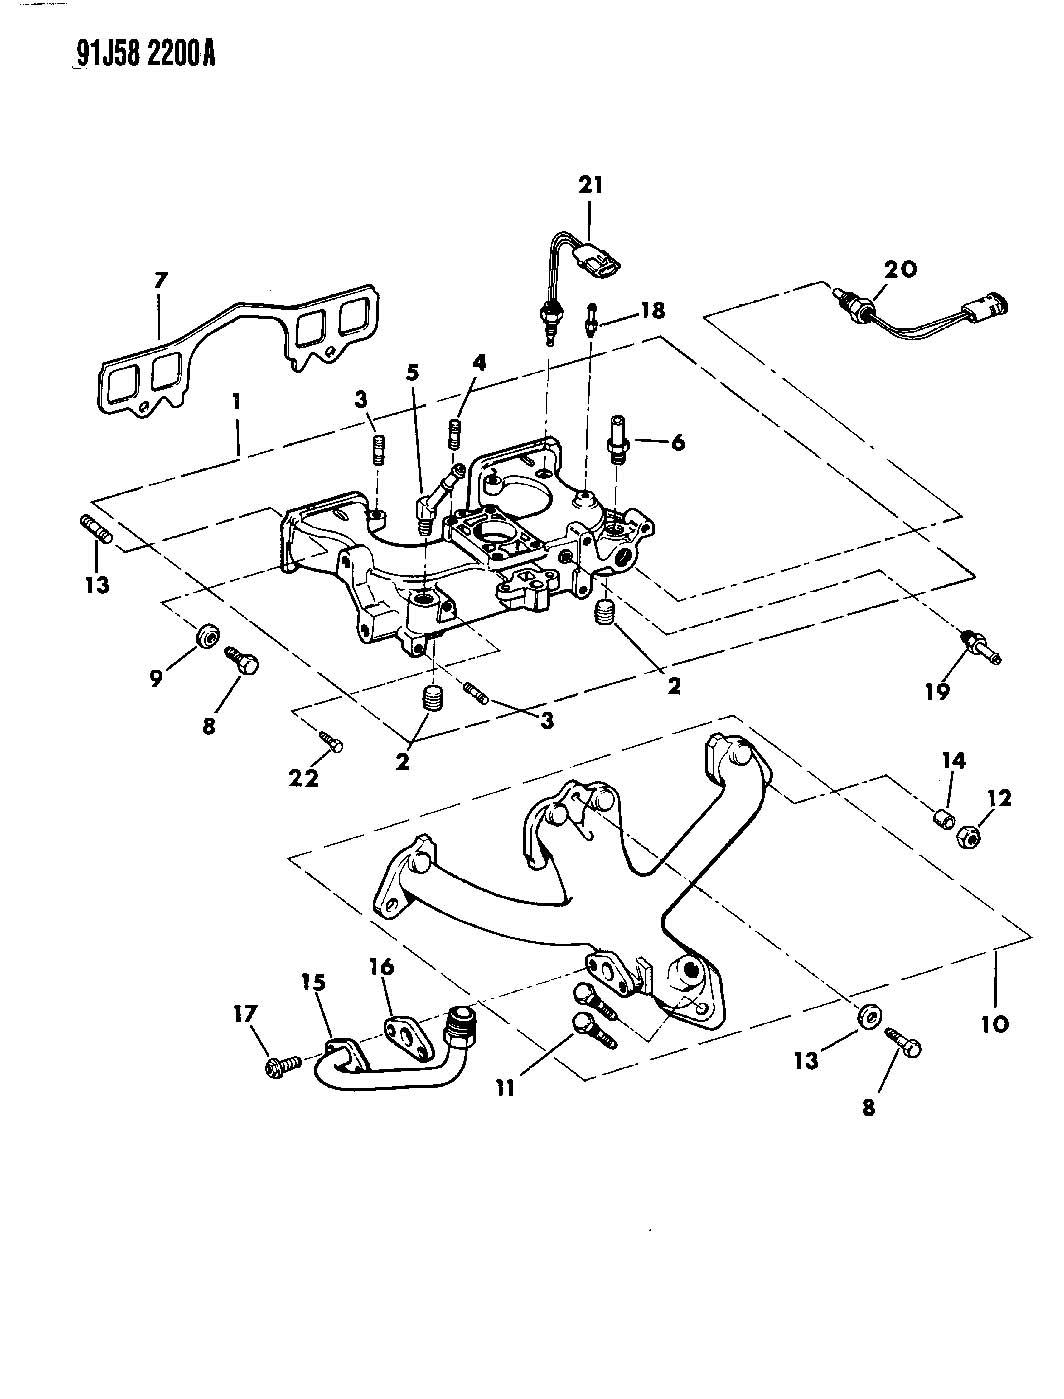 1995 chrysler cirrus fuse panel  chrysler  auto fuse box